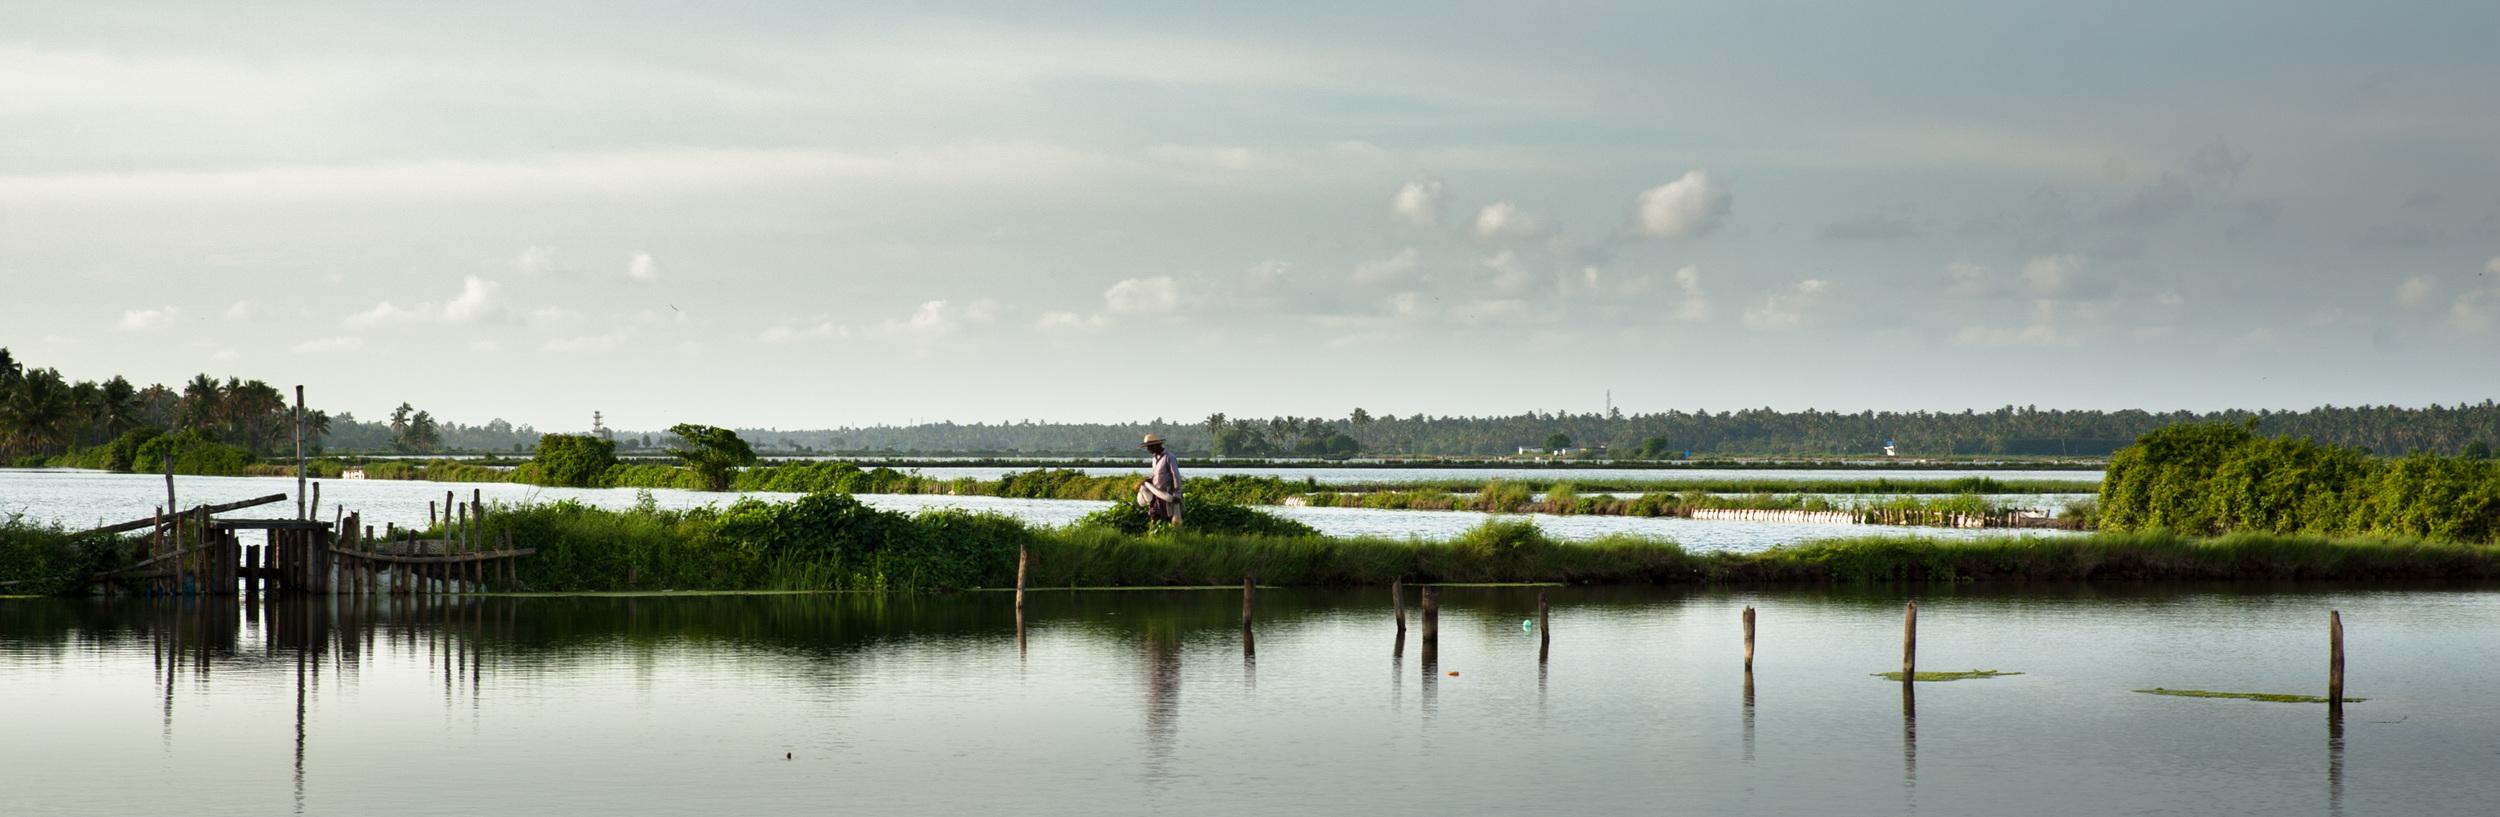 Fisherman returning home - Kerala